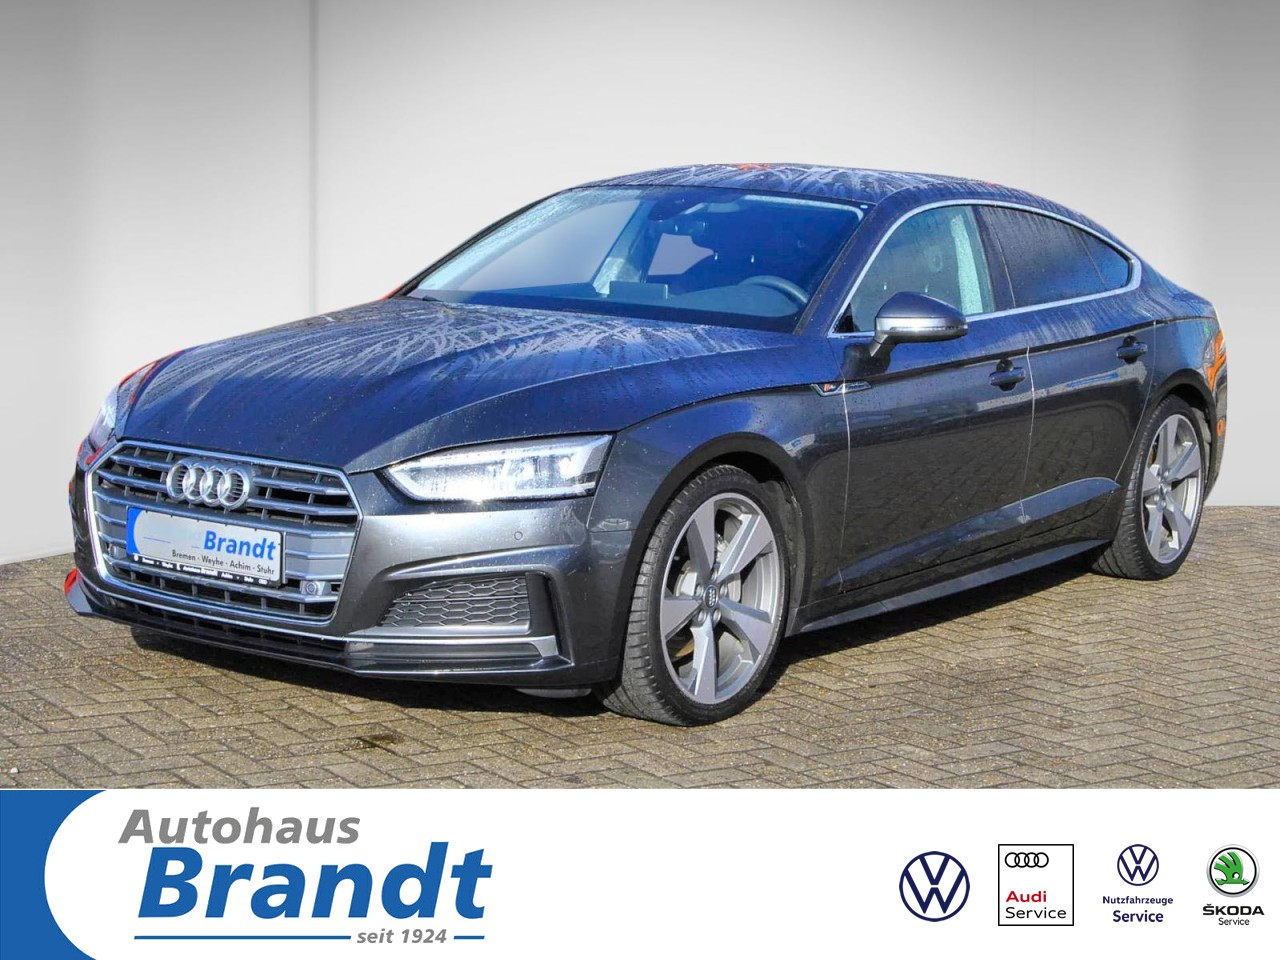 Audi A5 Sportback 40 TDI S-LINE*S-TRONIC*LED*NAVI+*GRA, Jahr 2019, Diesel